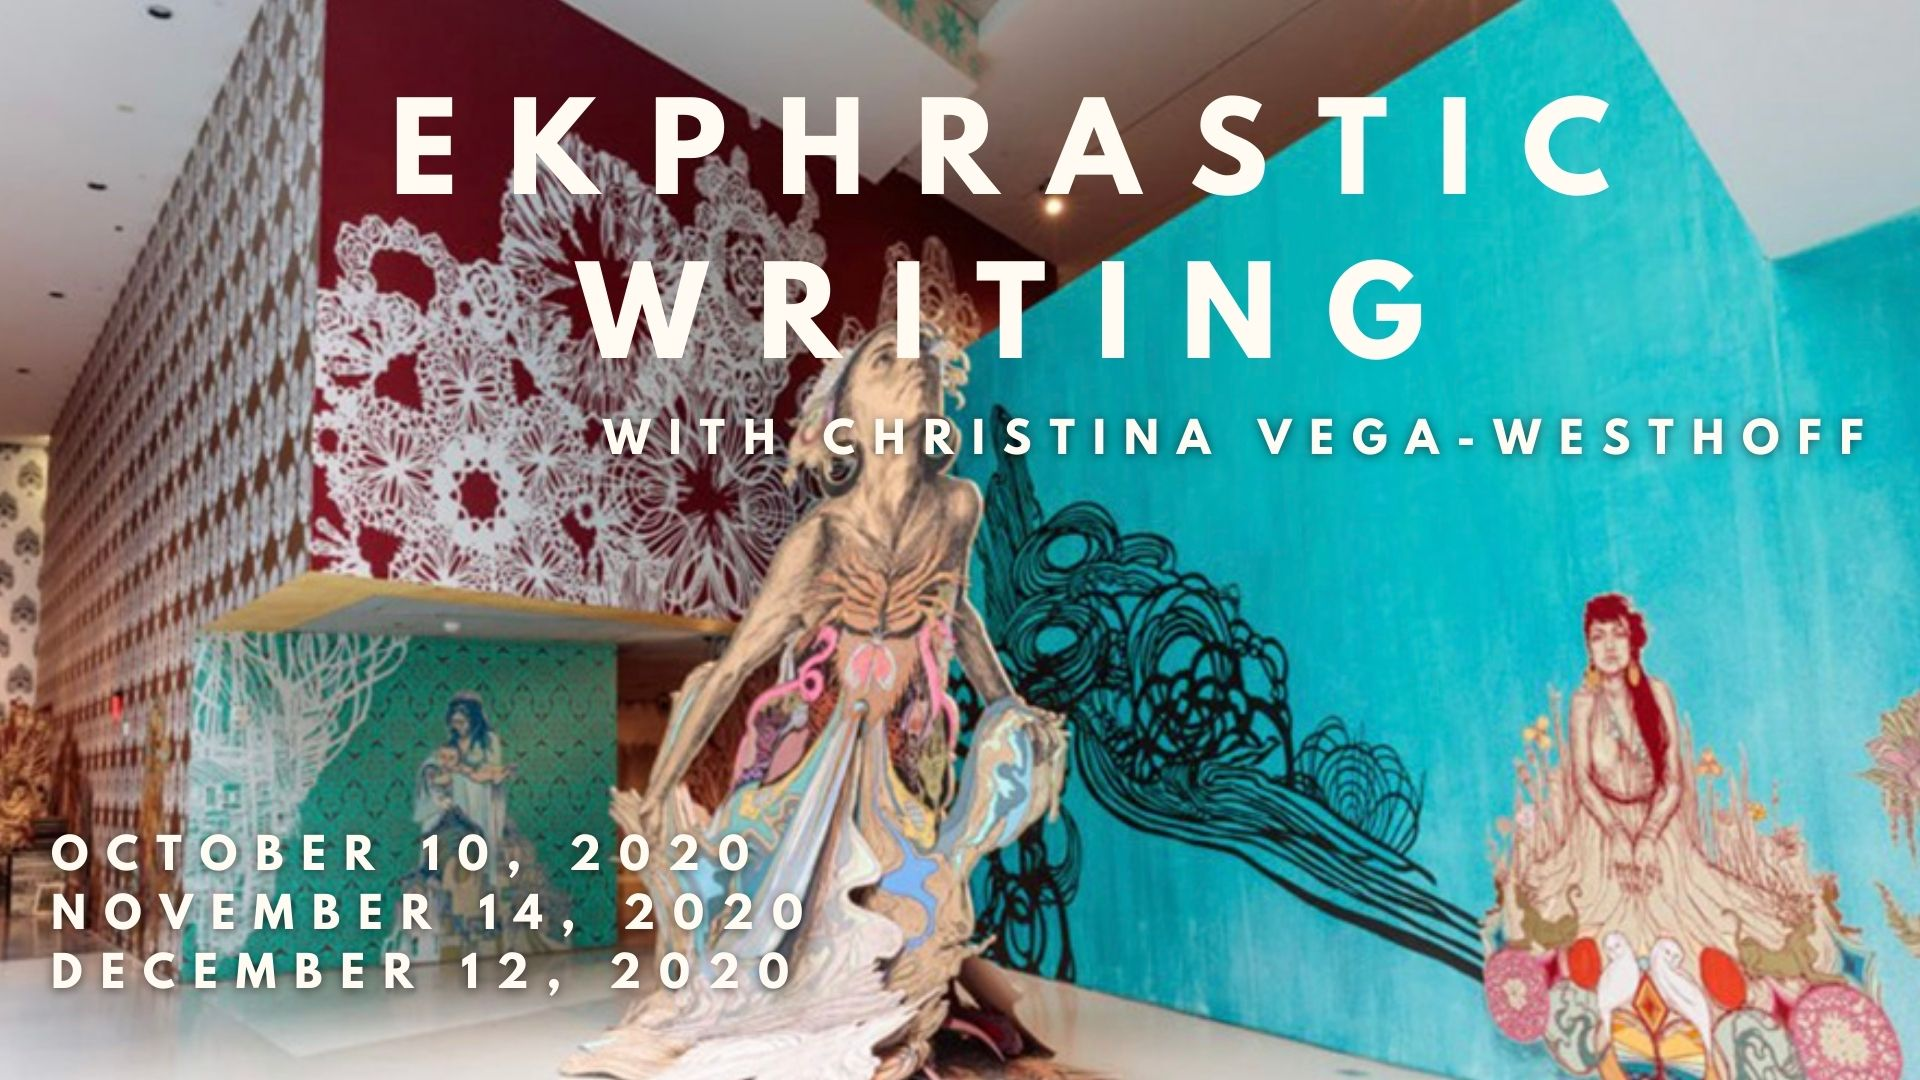 Ekphrastic Writing inspired by Swoon